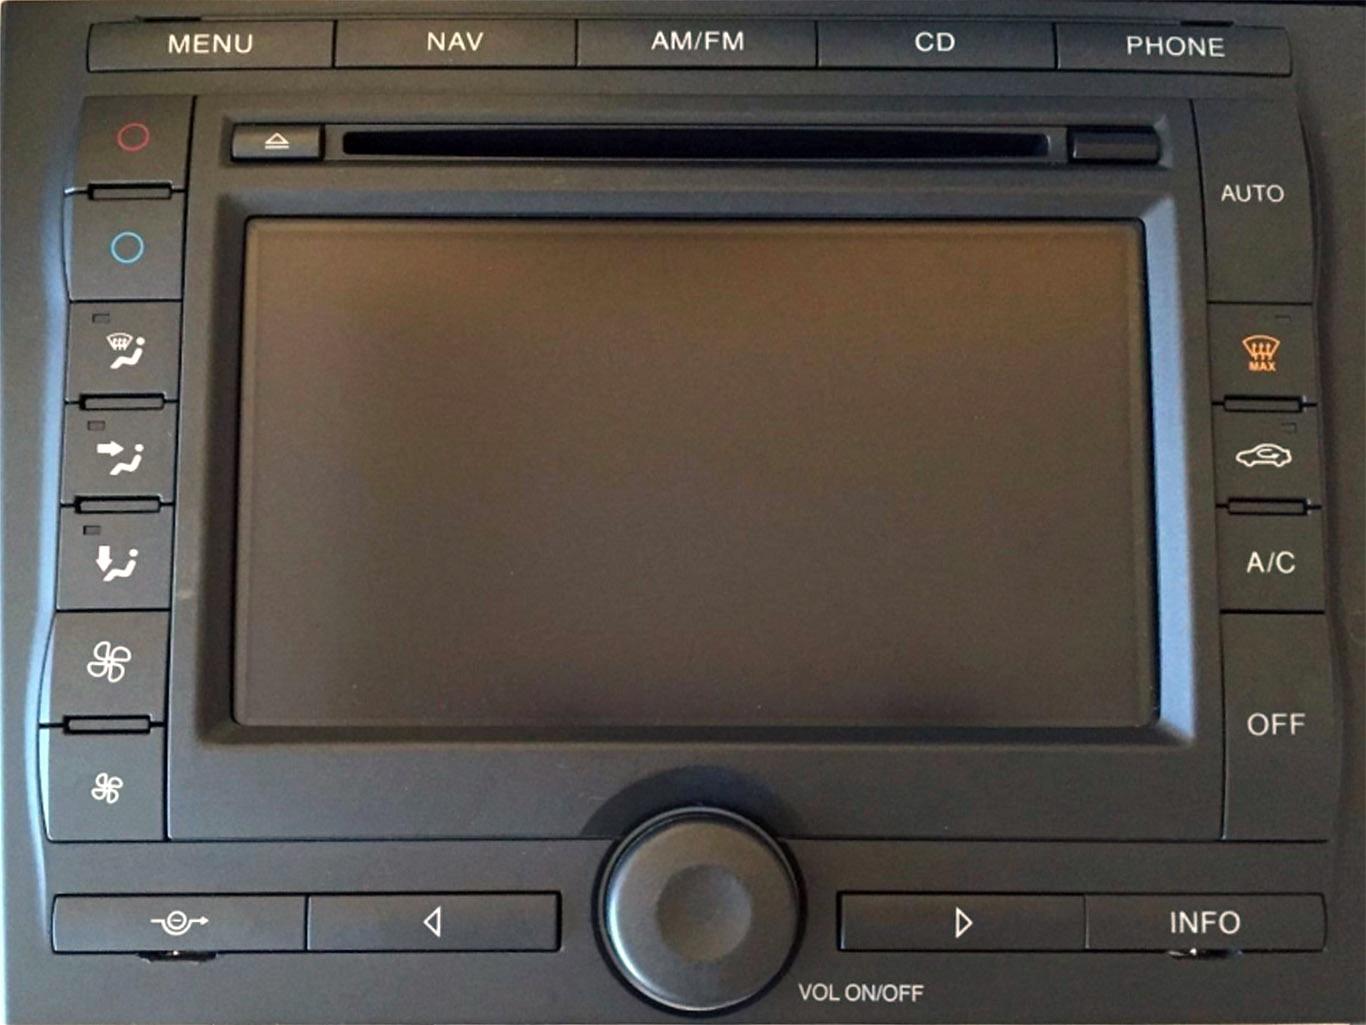 Ford Denso Navigationssystem - small.jpg